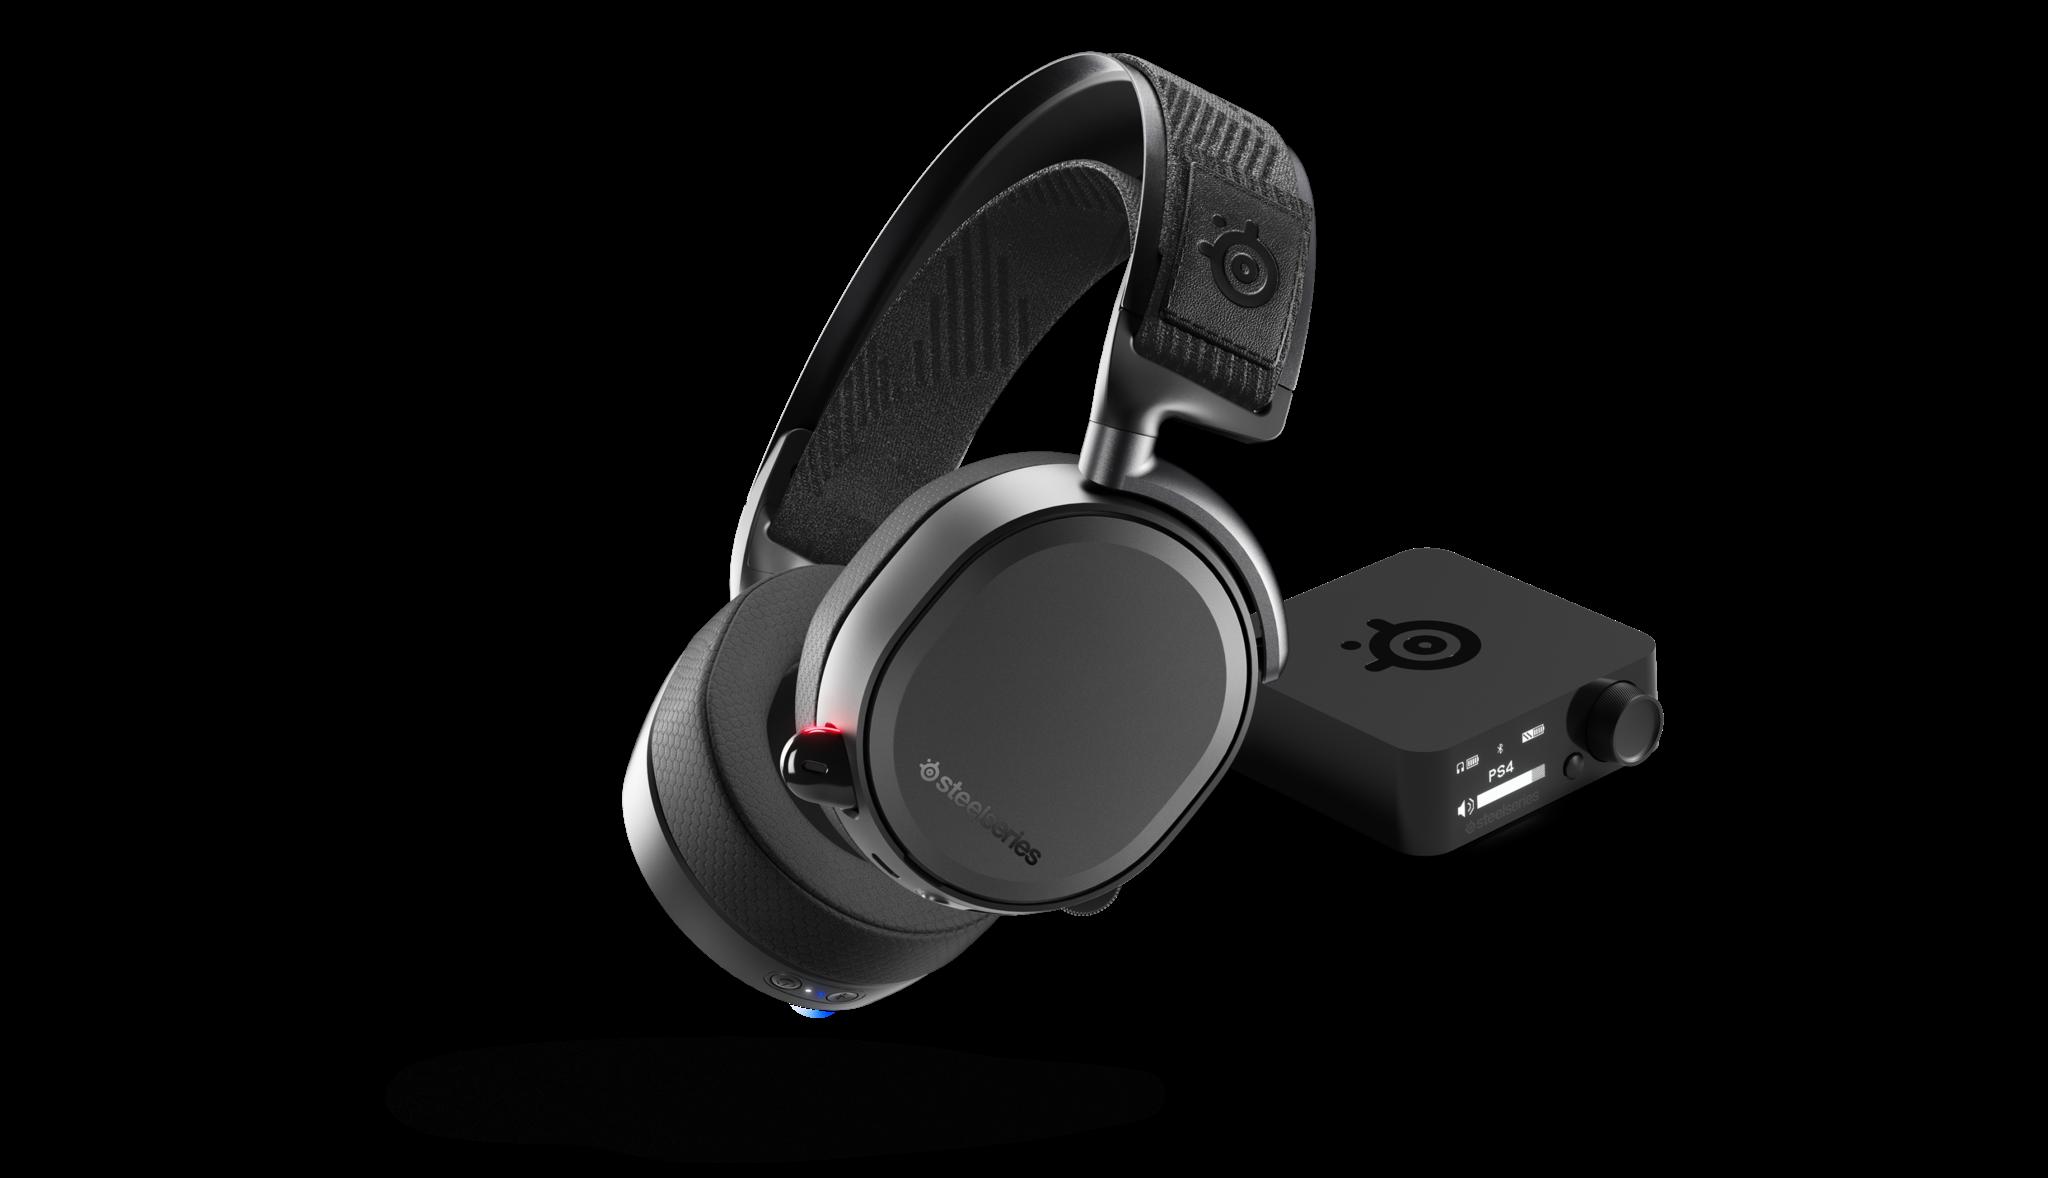 Steelseries - Arctis Pro Wireless Gaming Headset